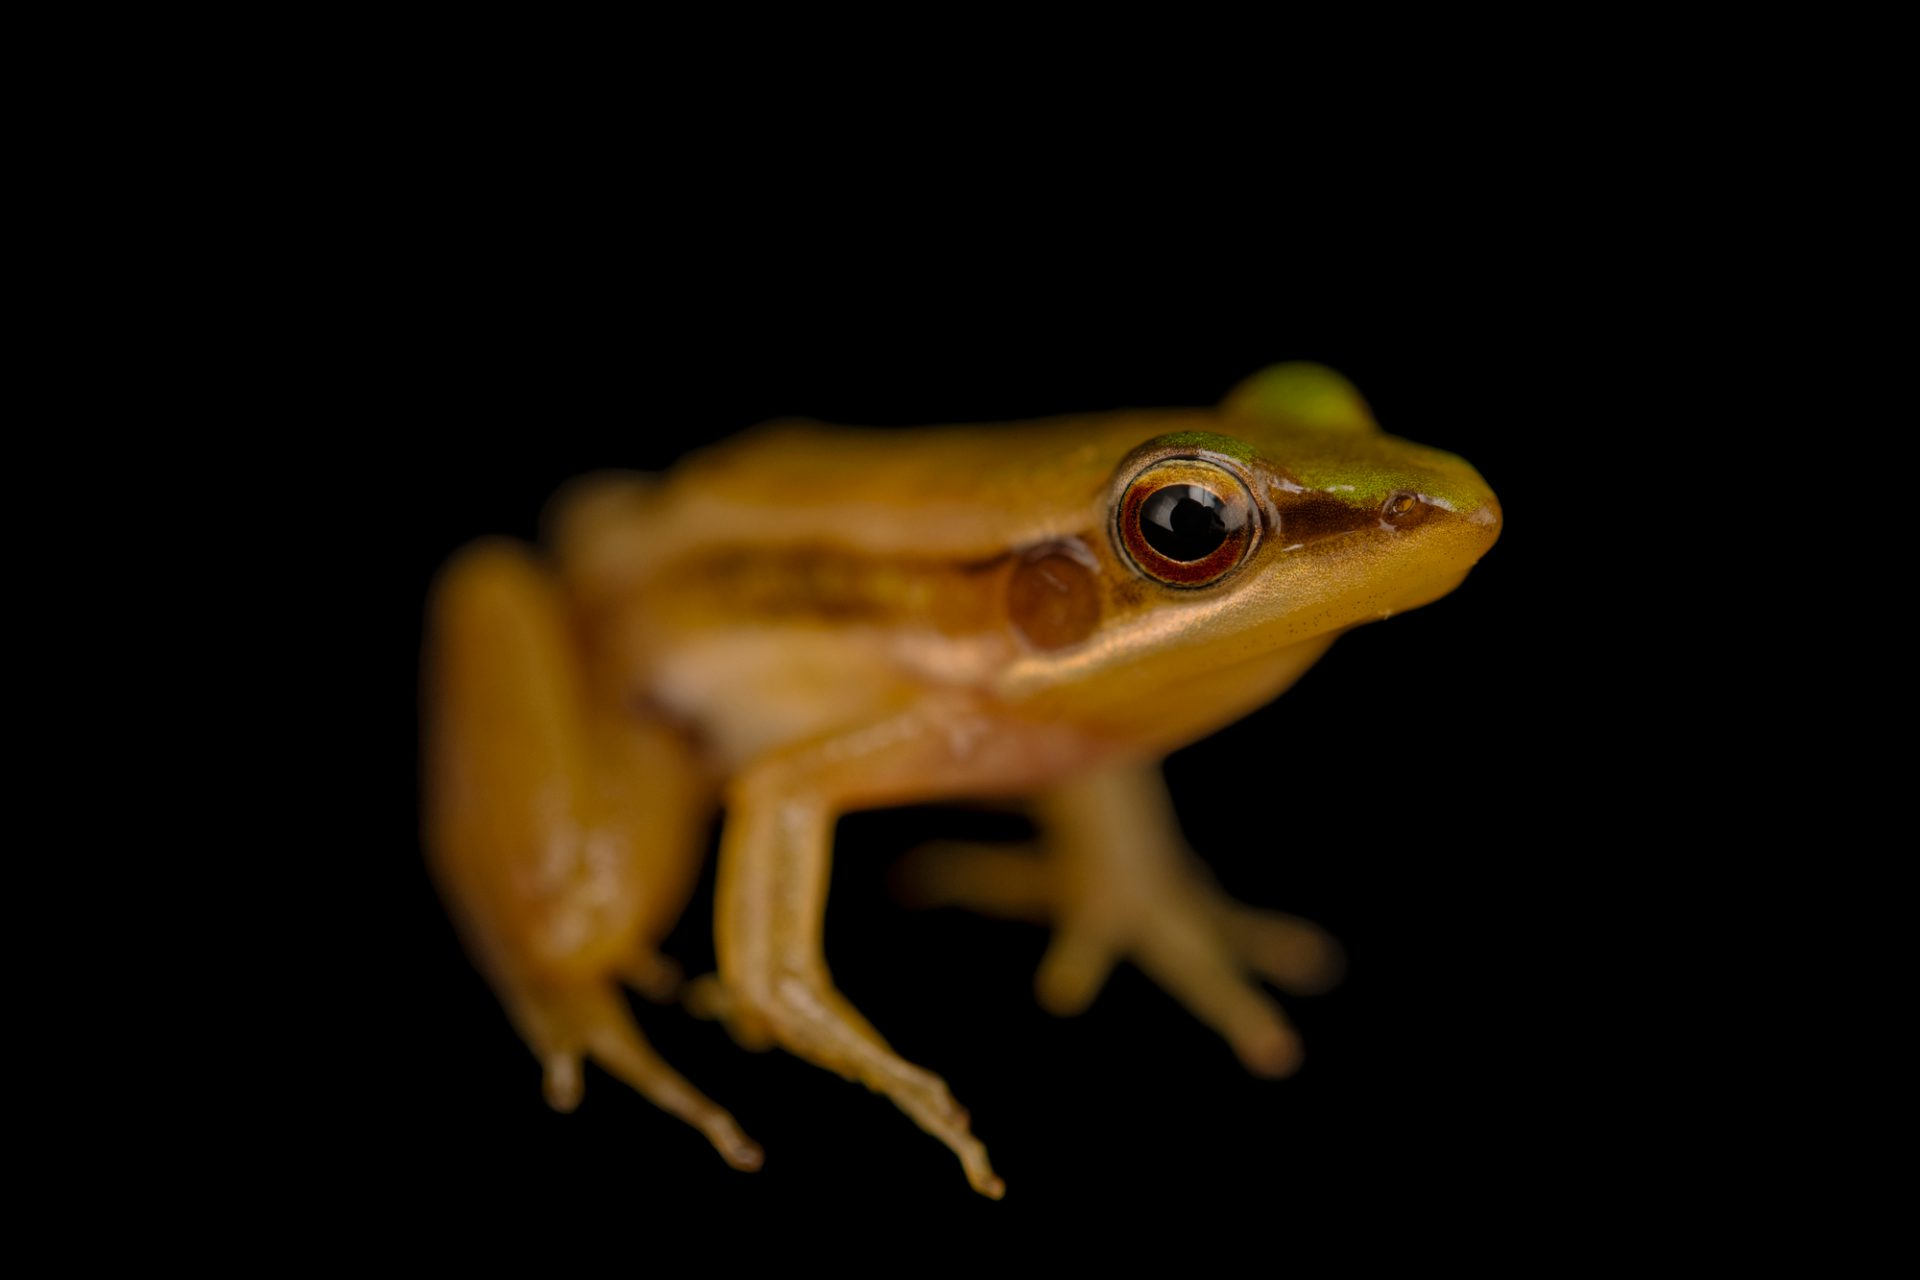 Photo: A Guangdong frog (Hylarana macrodactyla) from the wild in Cambodia.